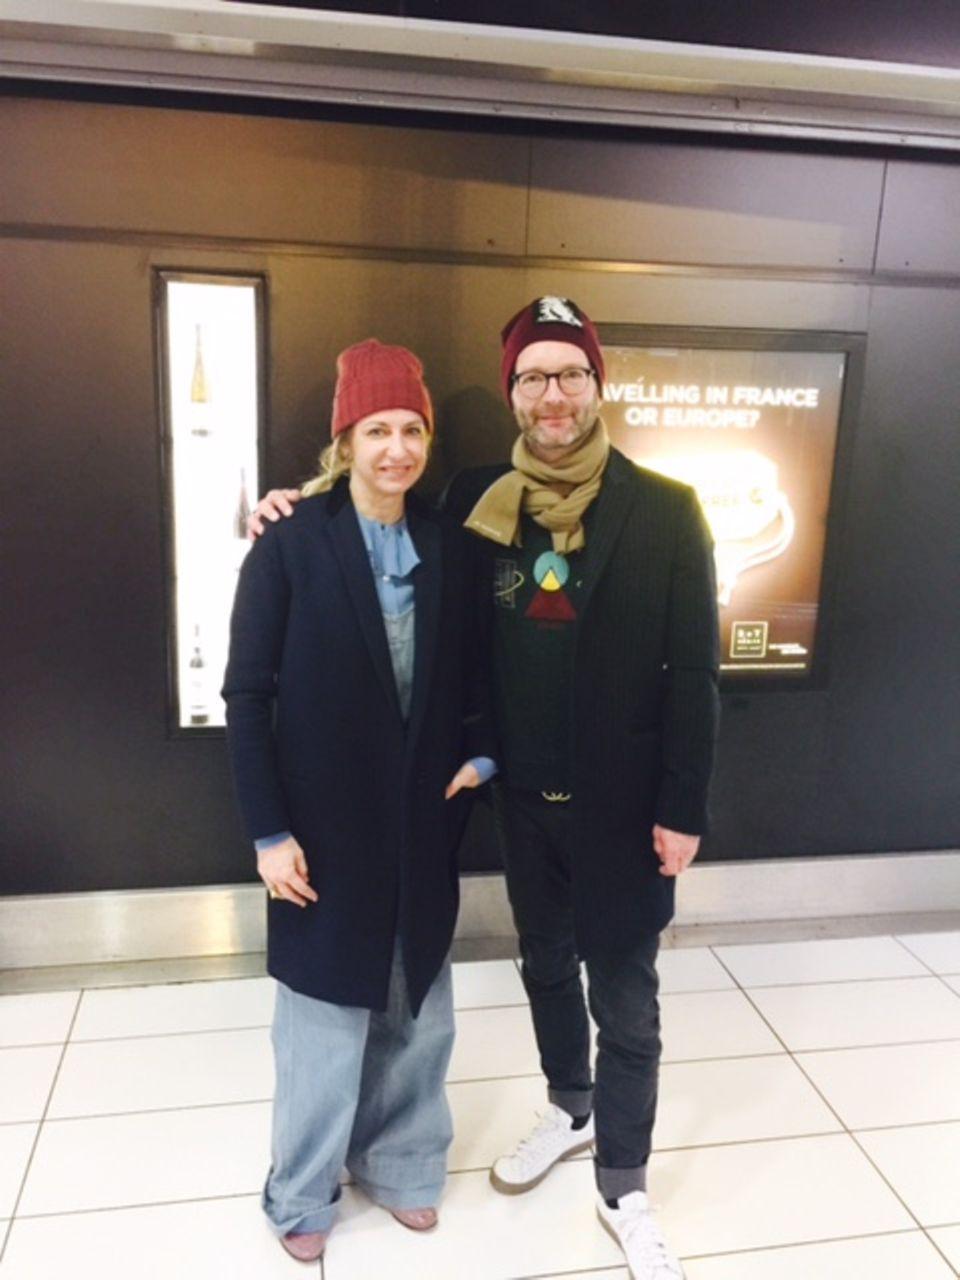 Double Trouble in Paris: Sue Giers und GALA-Modechef Marcus Luft